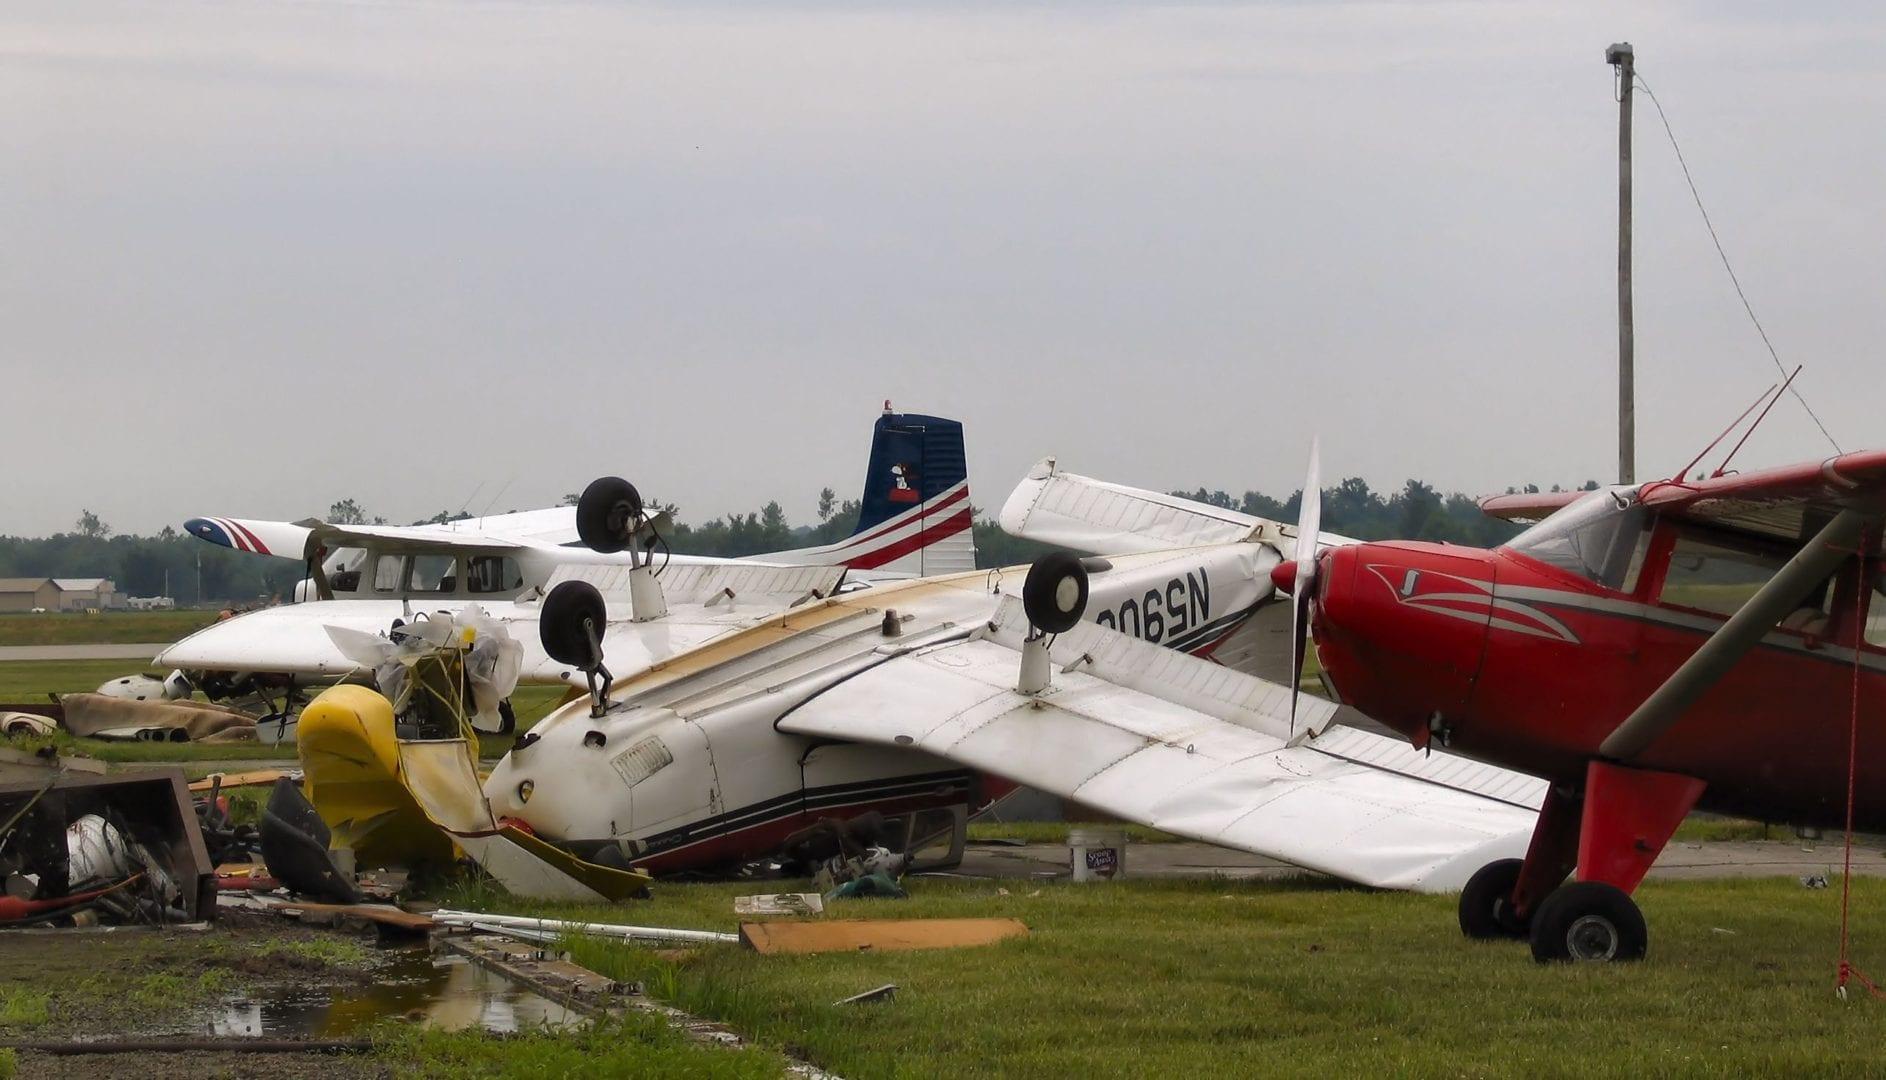 A crashed airplane